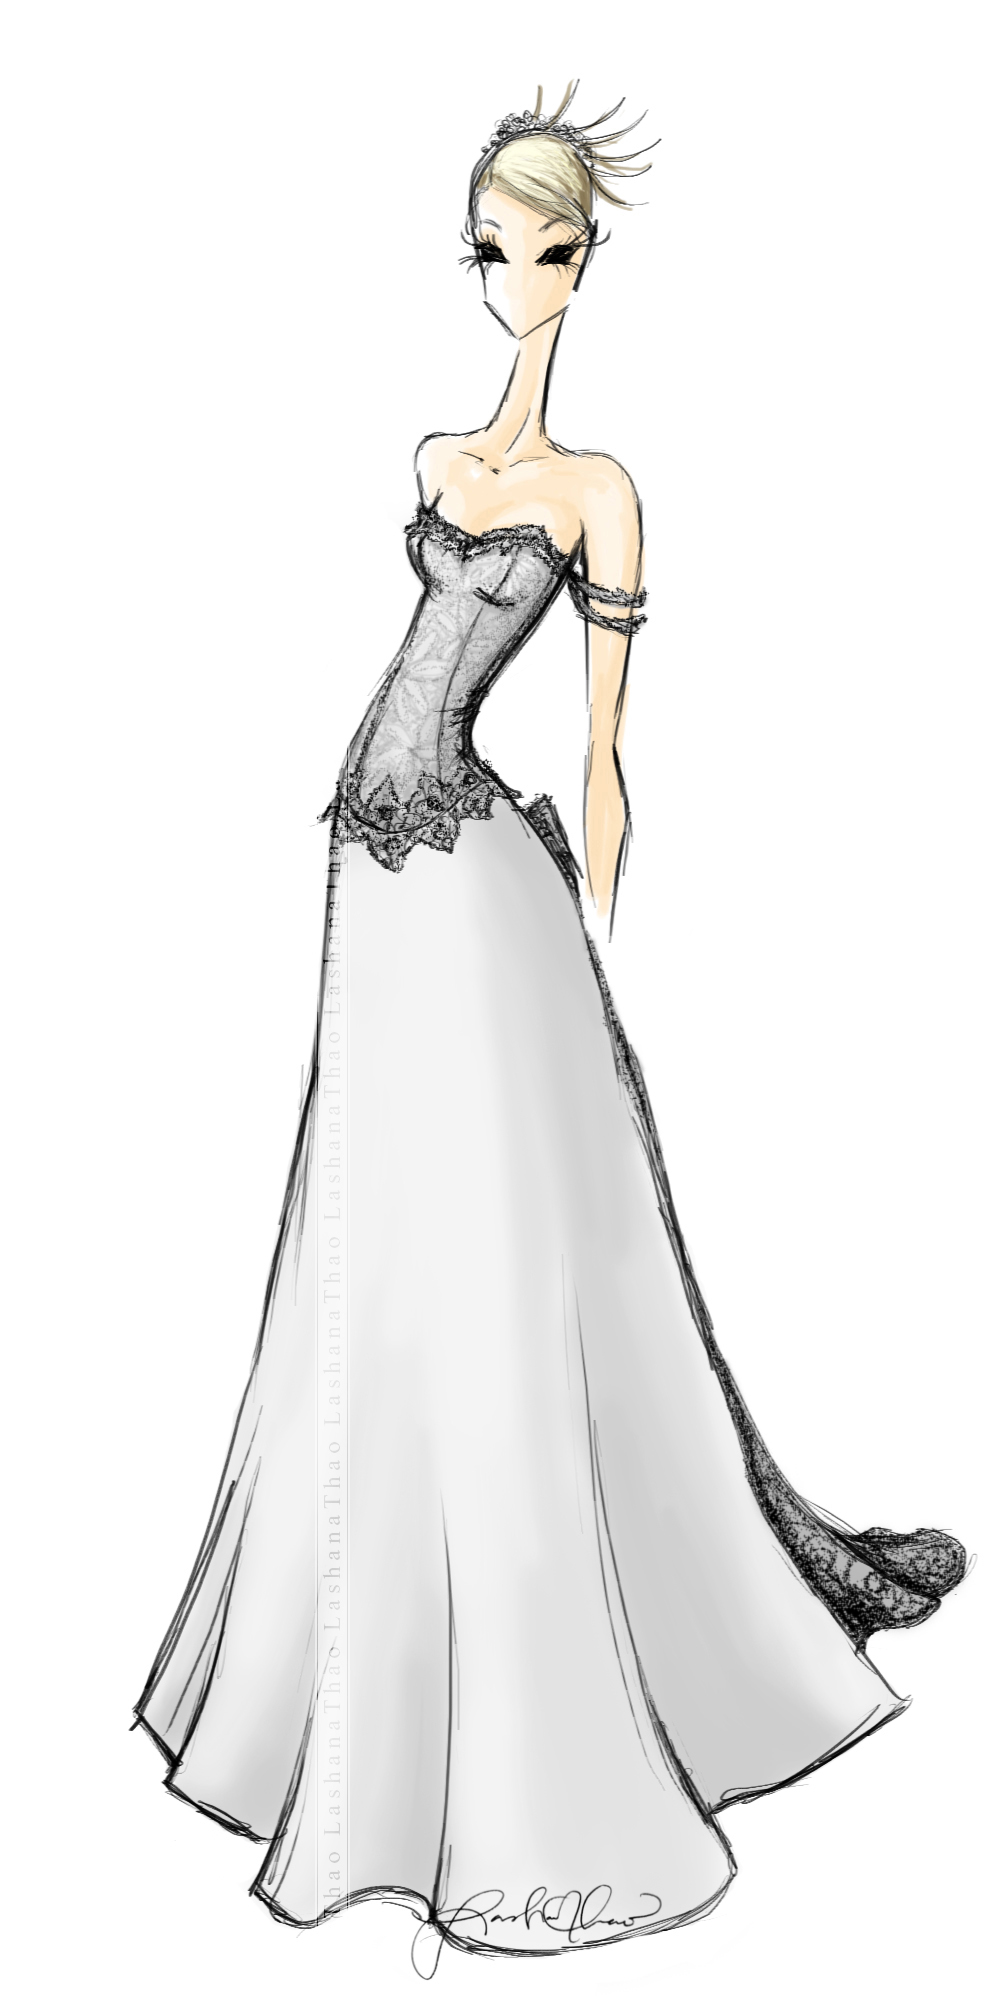 Drawn wedding dress fancy dress Etsy 00  Bridal dress